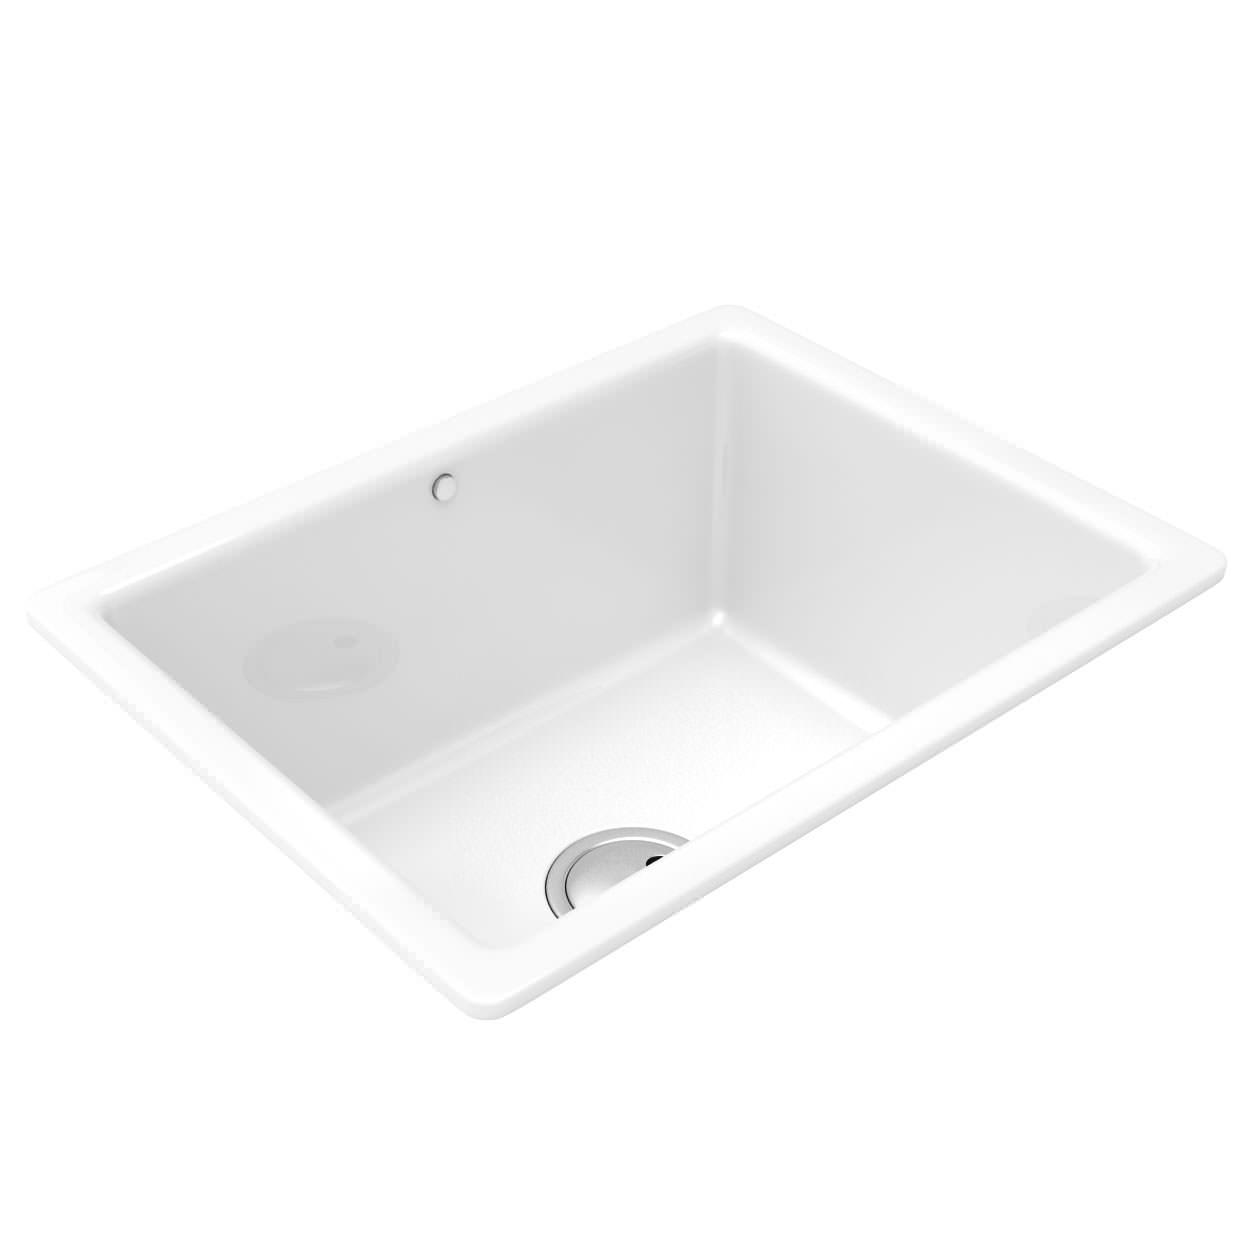 Abode Matrix CR25 1.0 Bowl Undermount Or Inset Ceramic Sink